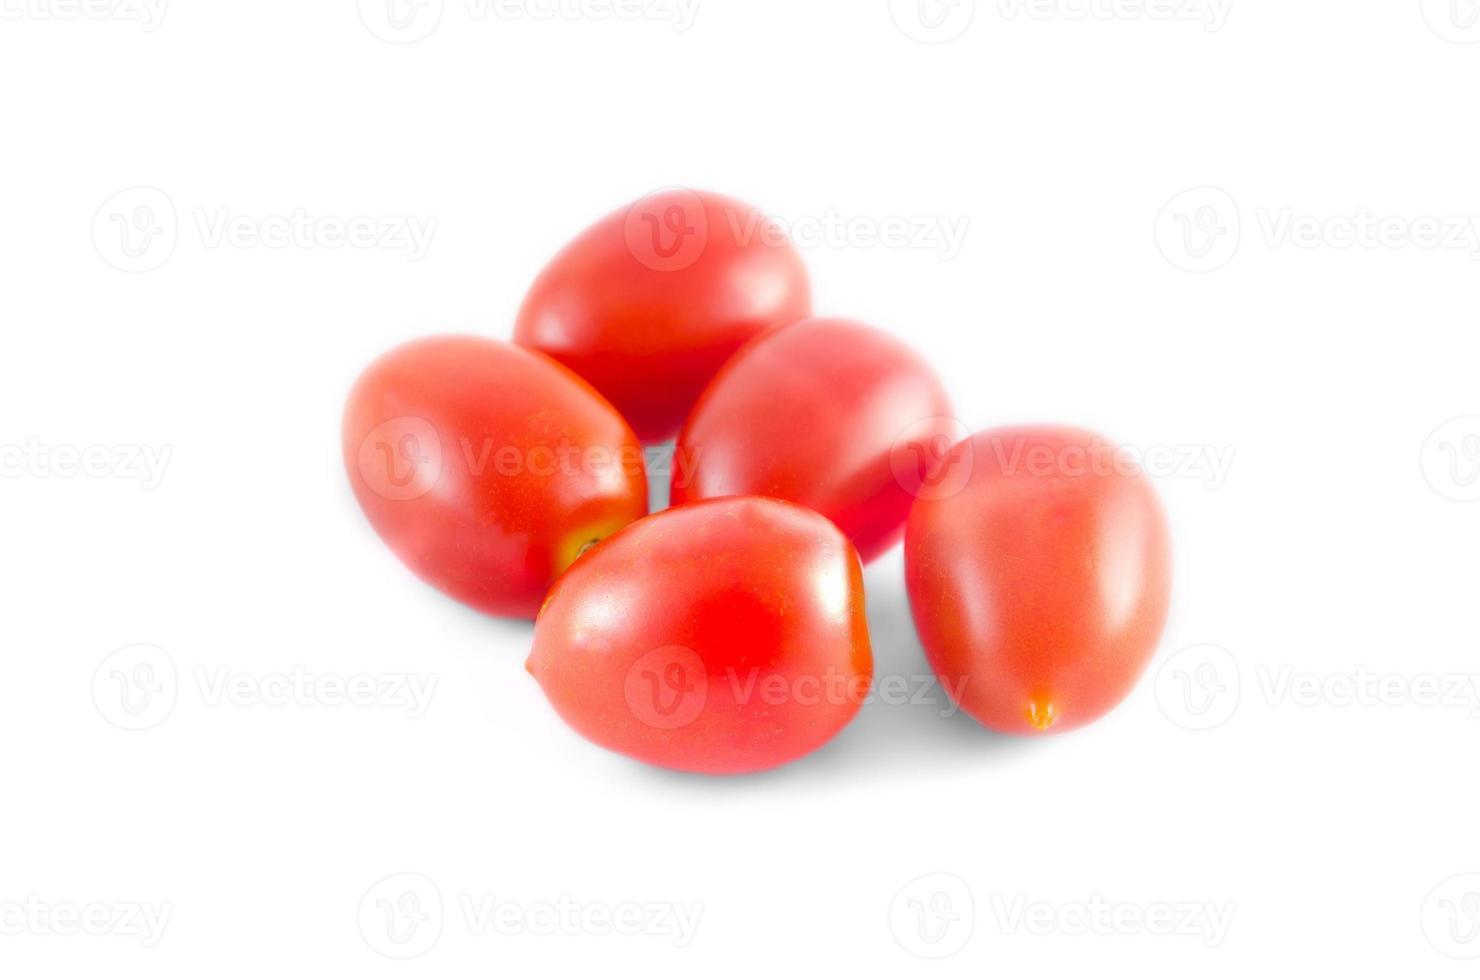 pomodori su sfondo bianco foto